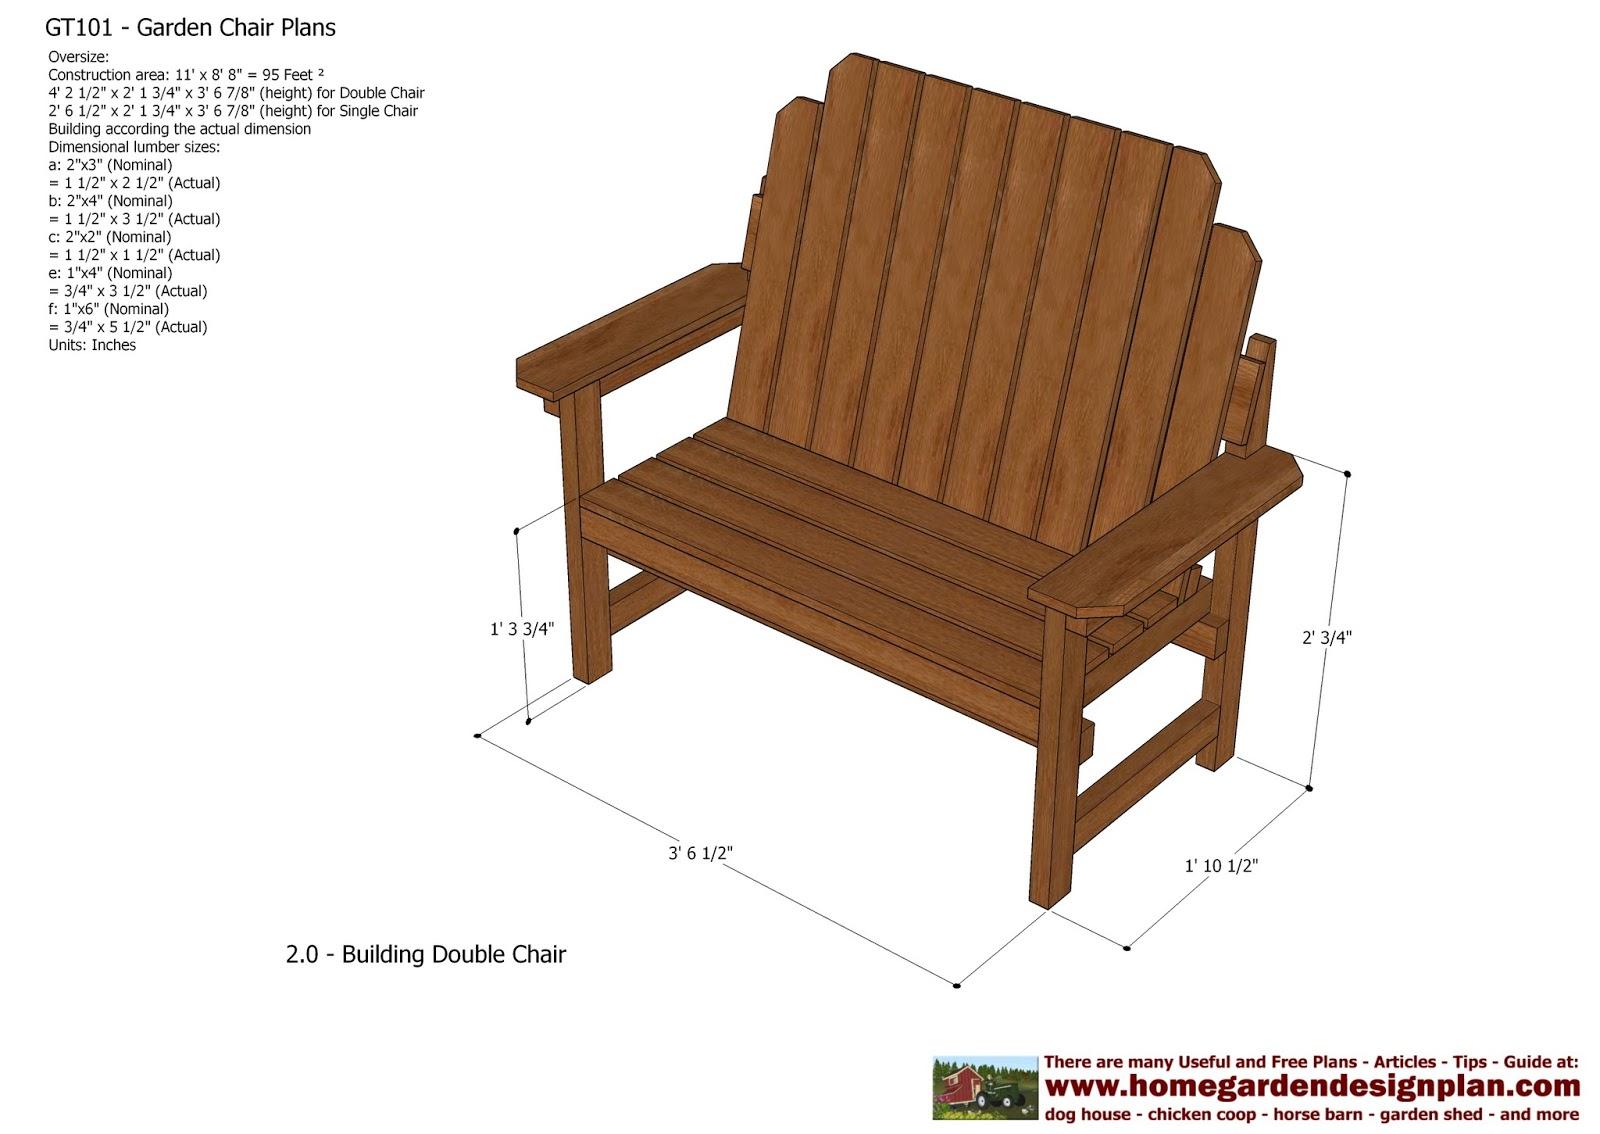 home garden plans: GT101 - Garden Teak Table Plans - Out ...